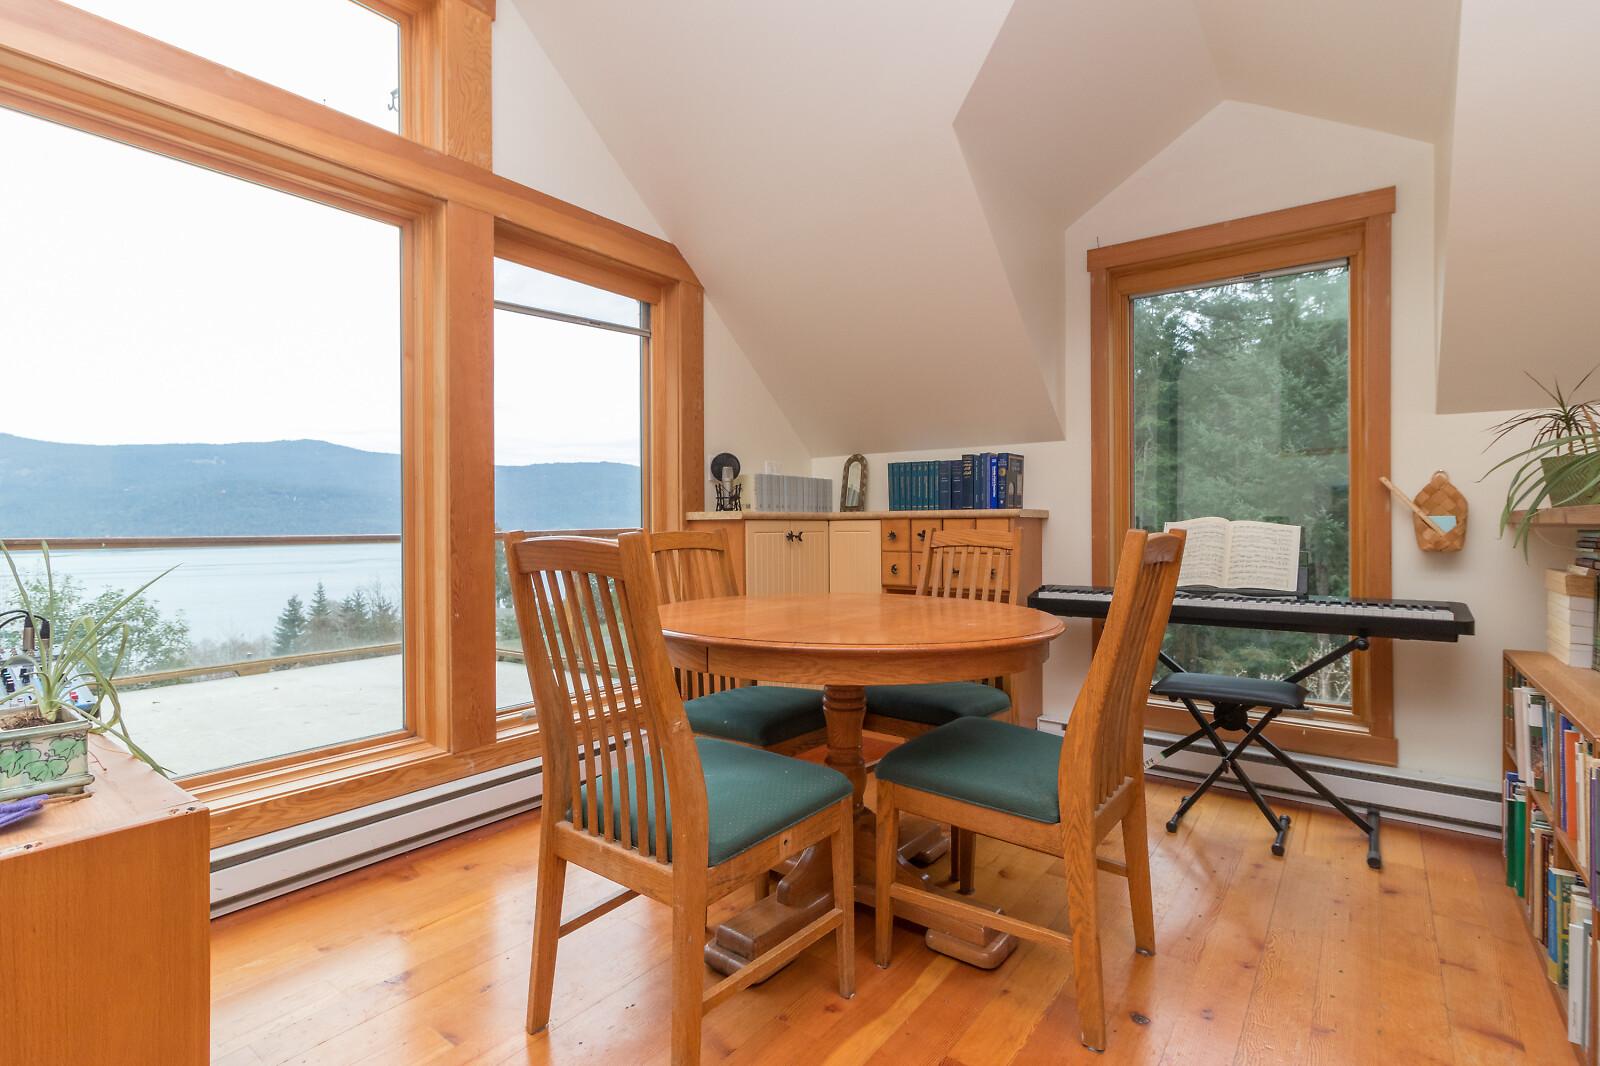 4362 Brentview Dr, Cowichan Bay, British Columbia  V0R 1N2 - Photo 8 - 868691